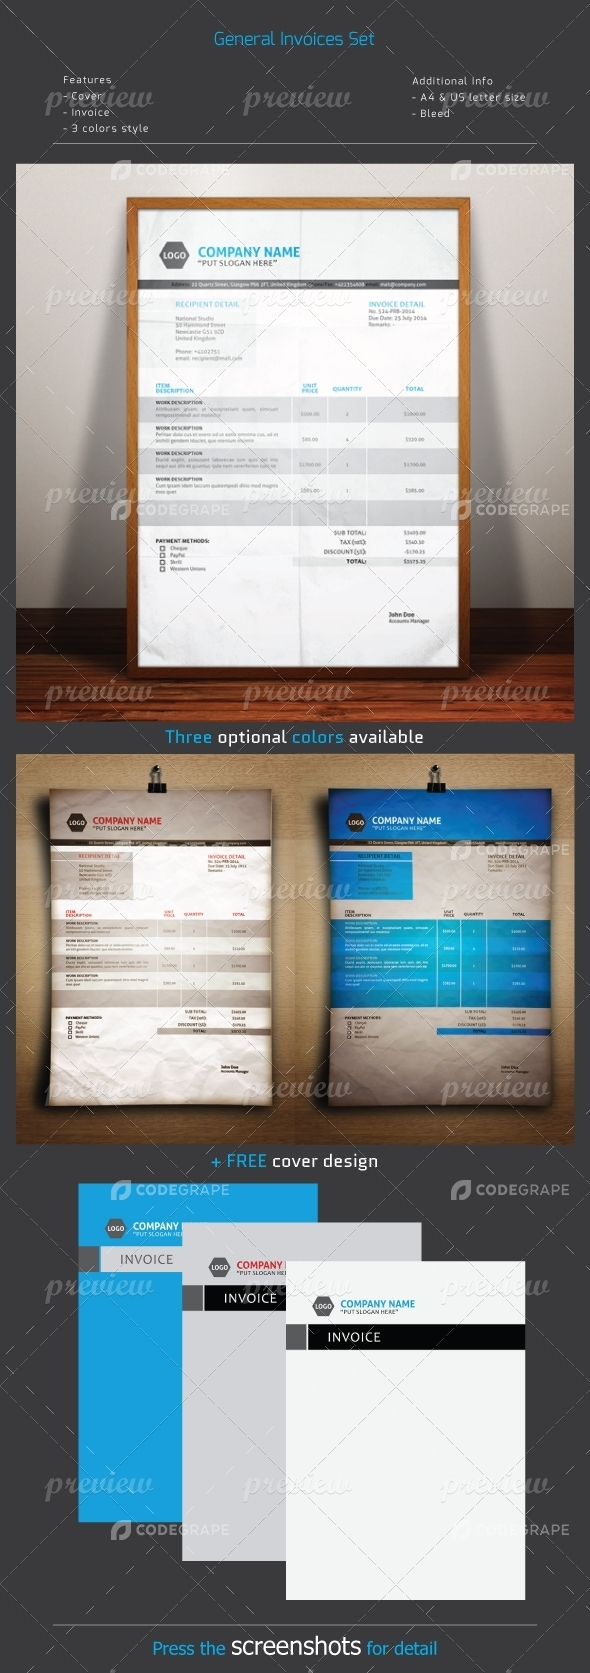 General Invoice Set